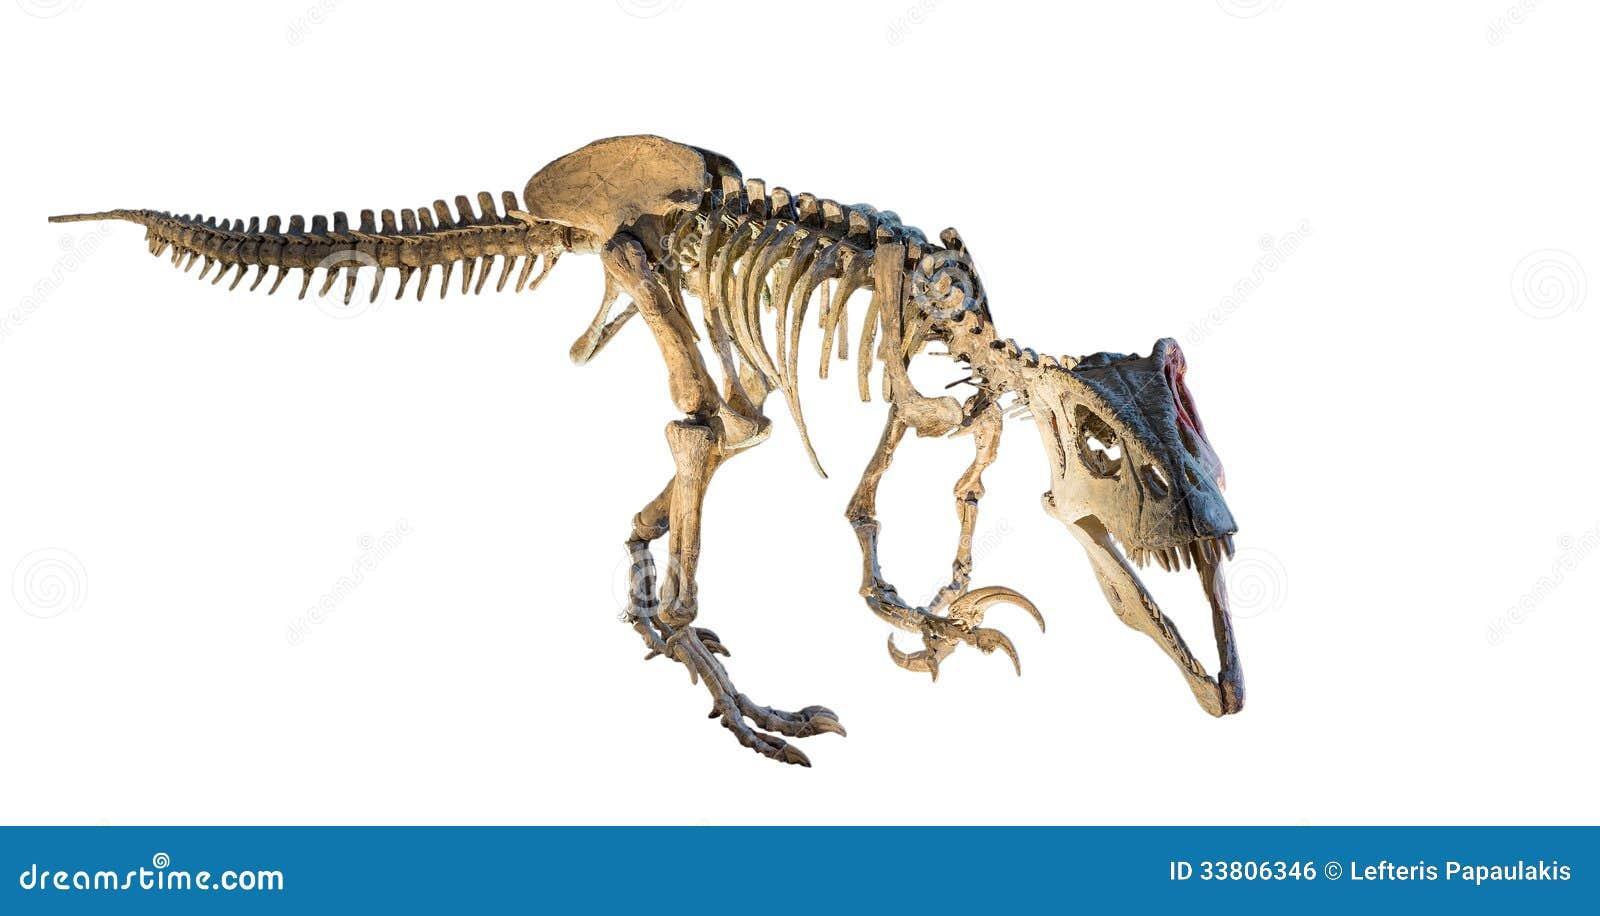 Megaraptor (Megaraptor namunhuaiquii) skeleton isolated